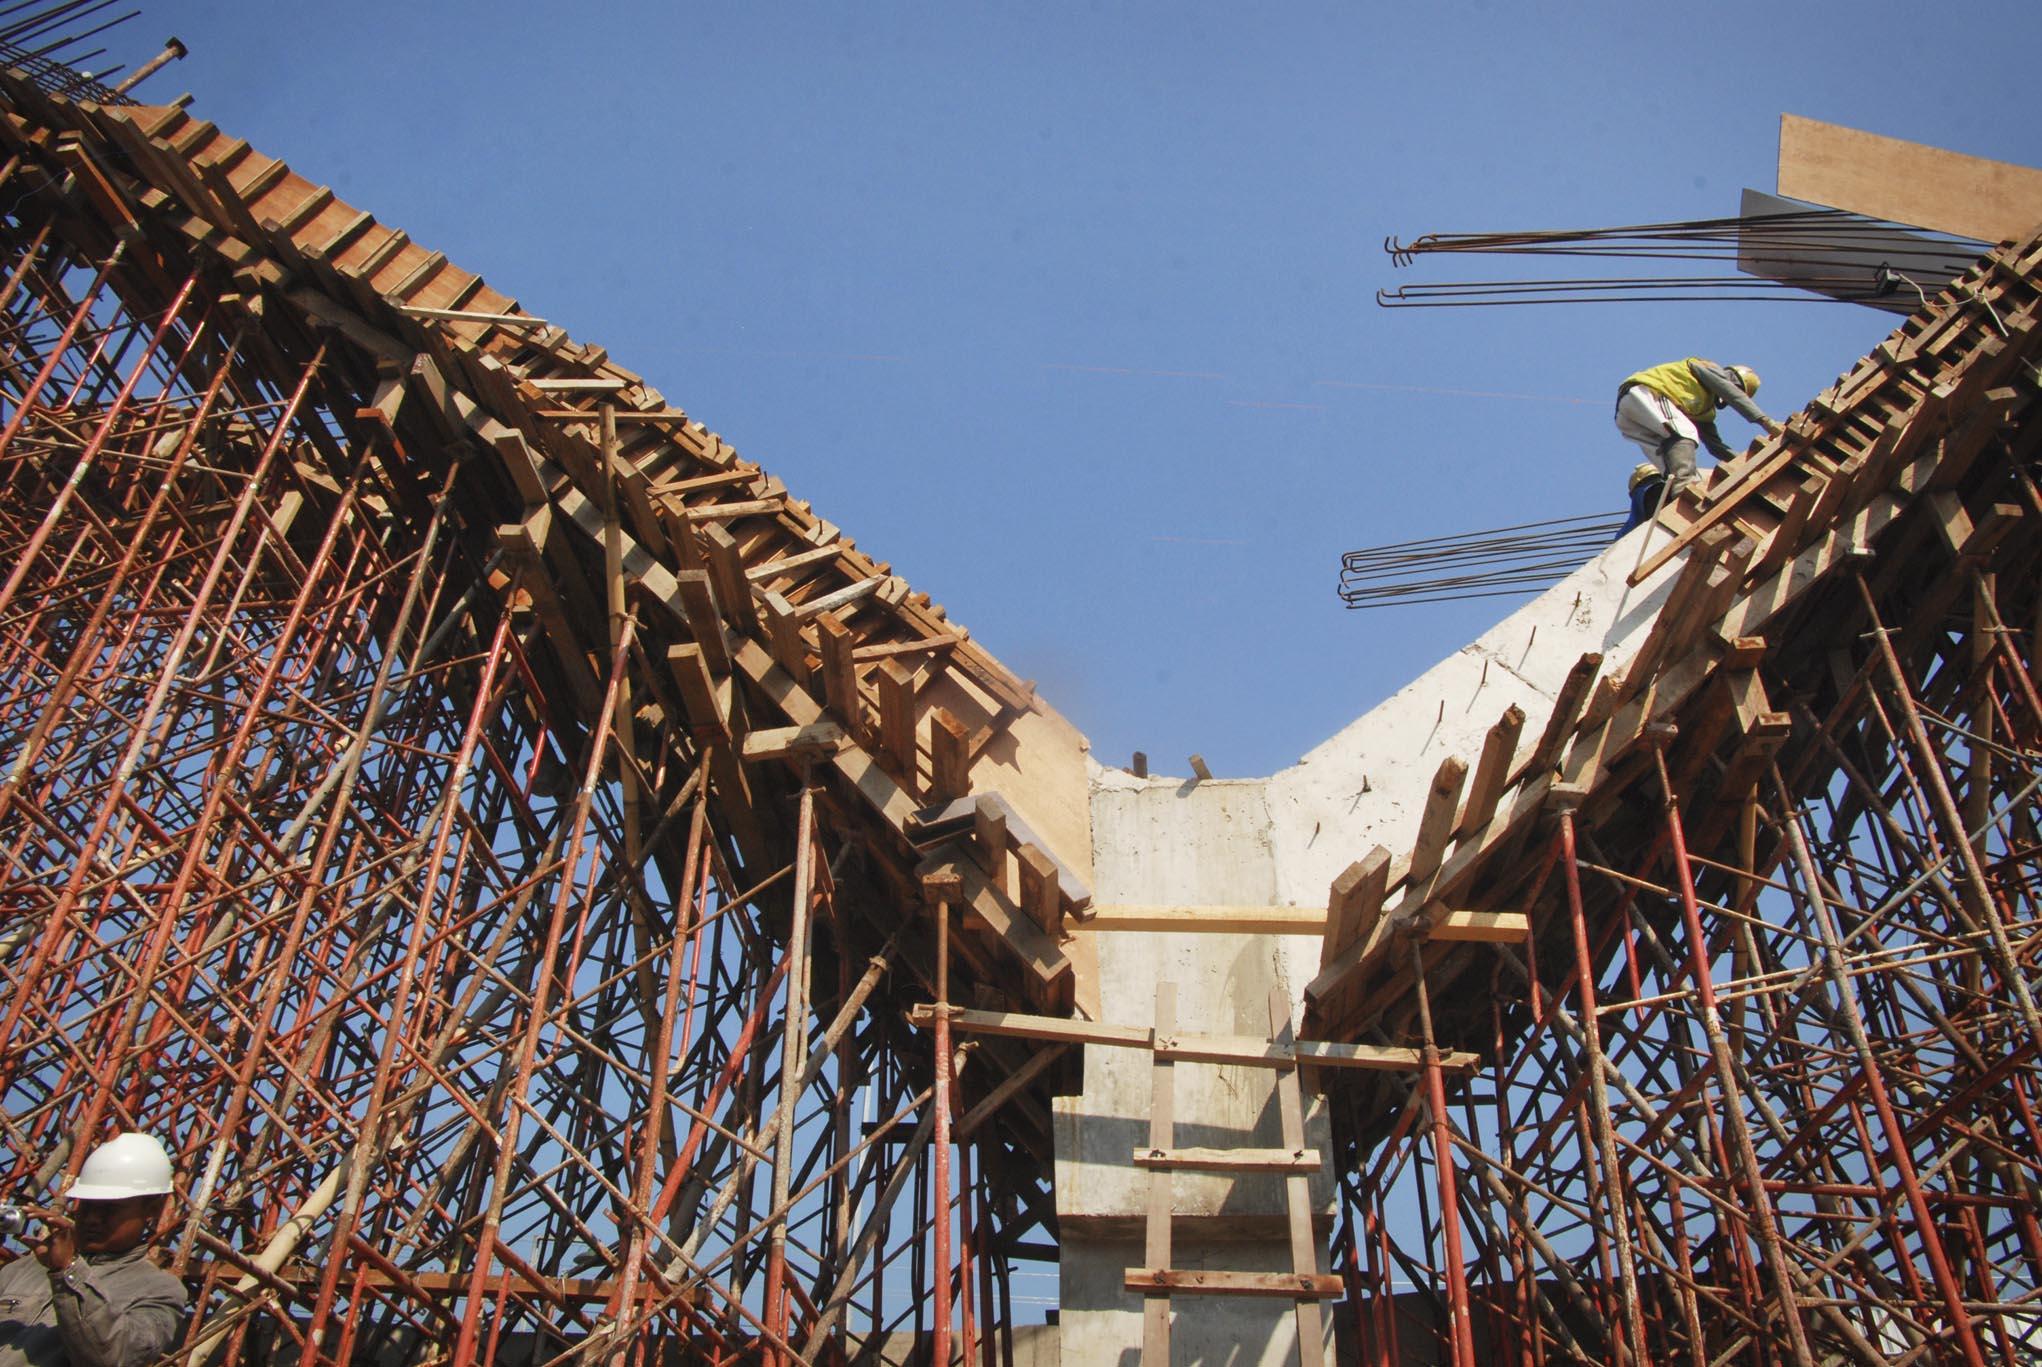 Monumen Berita Daerah Pembangunan Kudus Kota Kretek Syu Kab Kediri